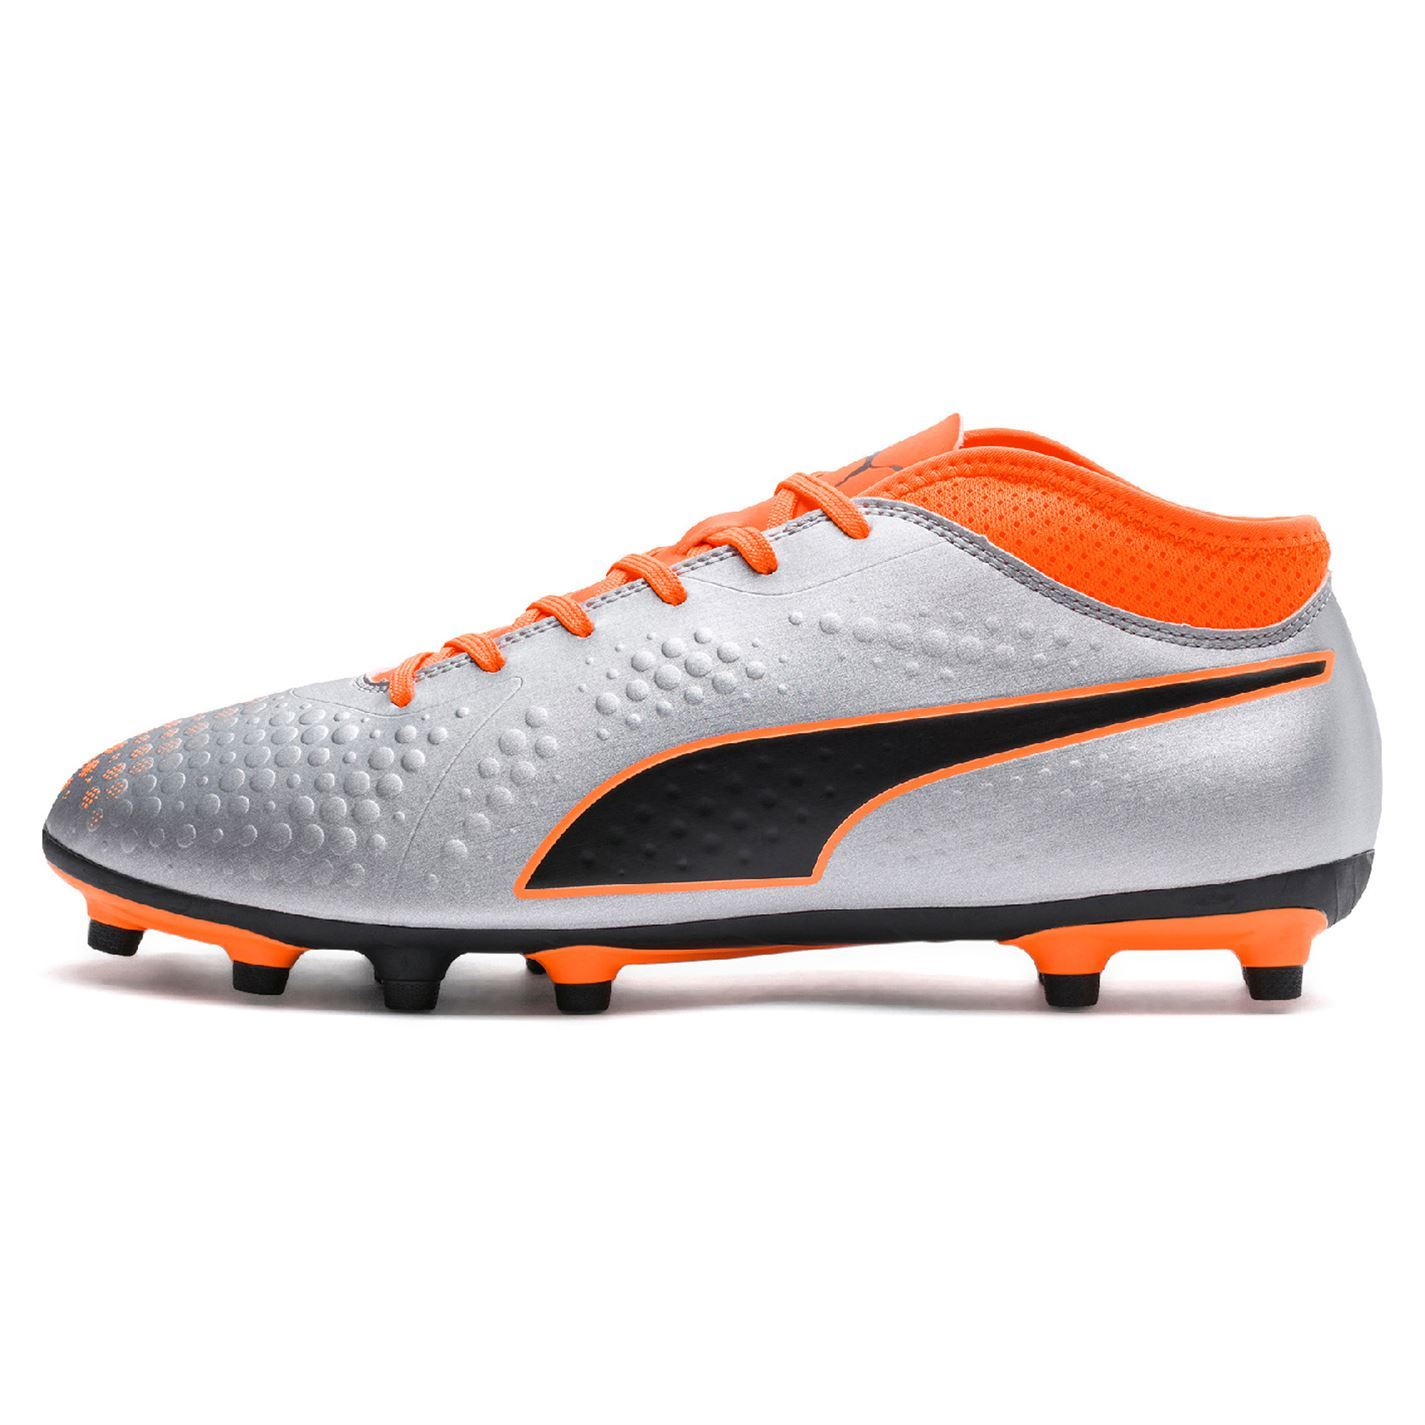 miniature 9 - Puma 4 FG Firm Ground Chaussures De Football Homme Football Chaussures Crampons